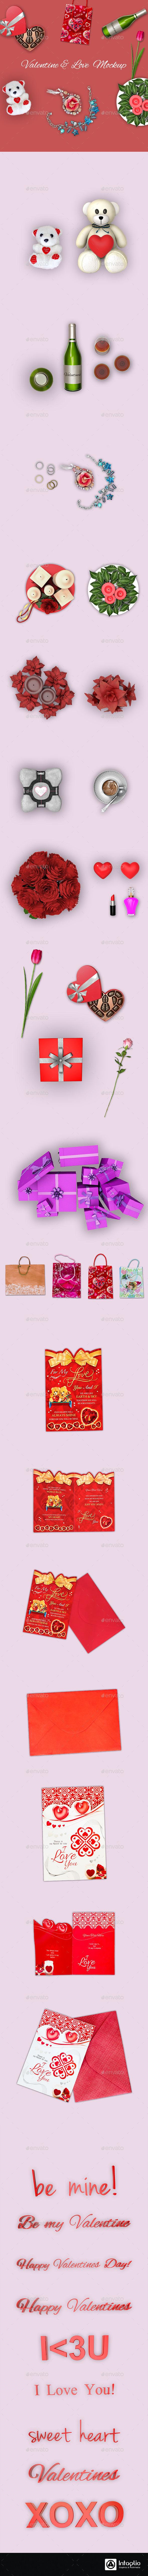 GraphicRiver Valentine Love Assets & Mockup 10360633